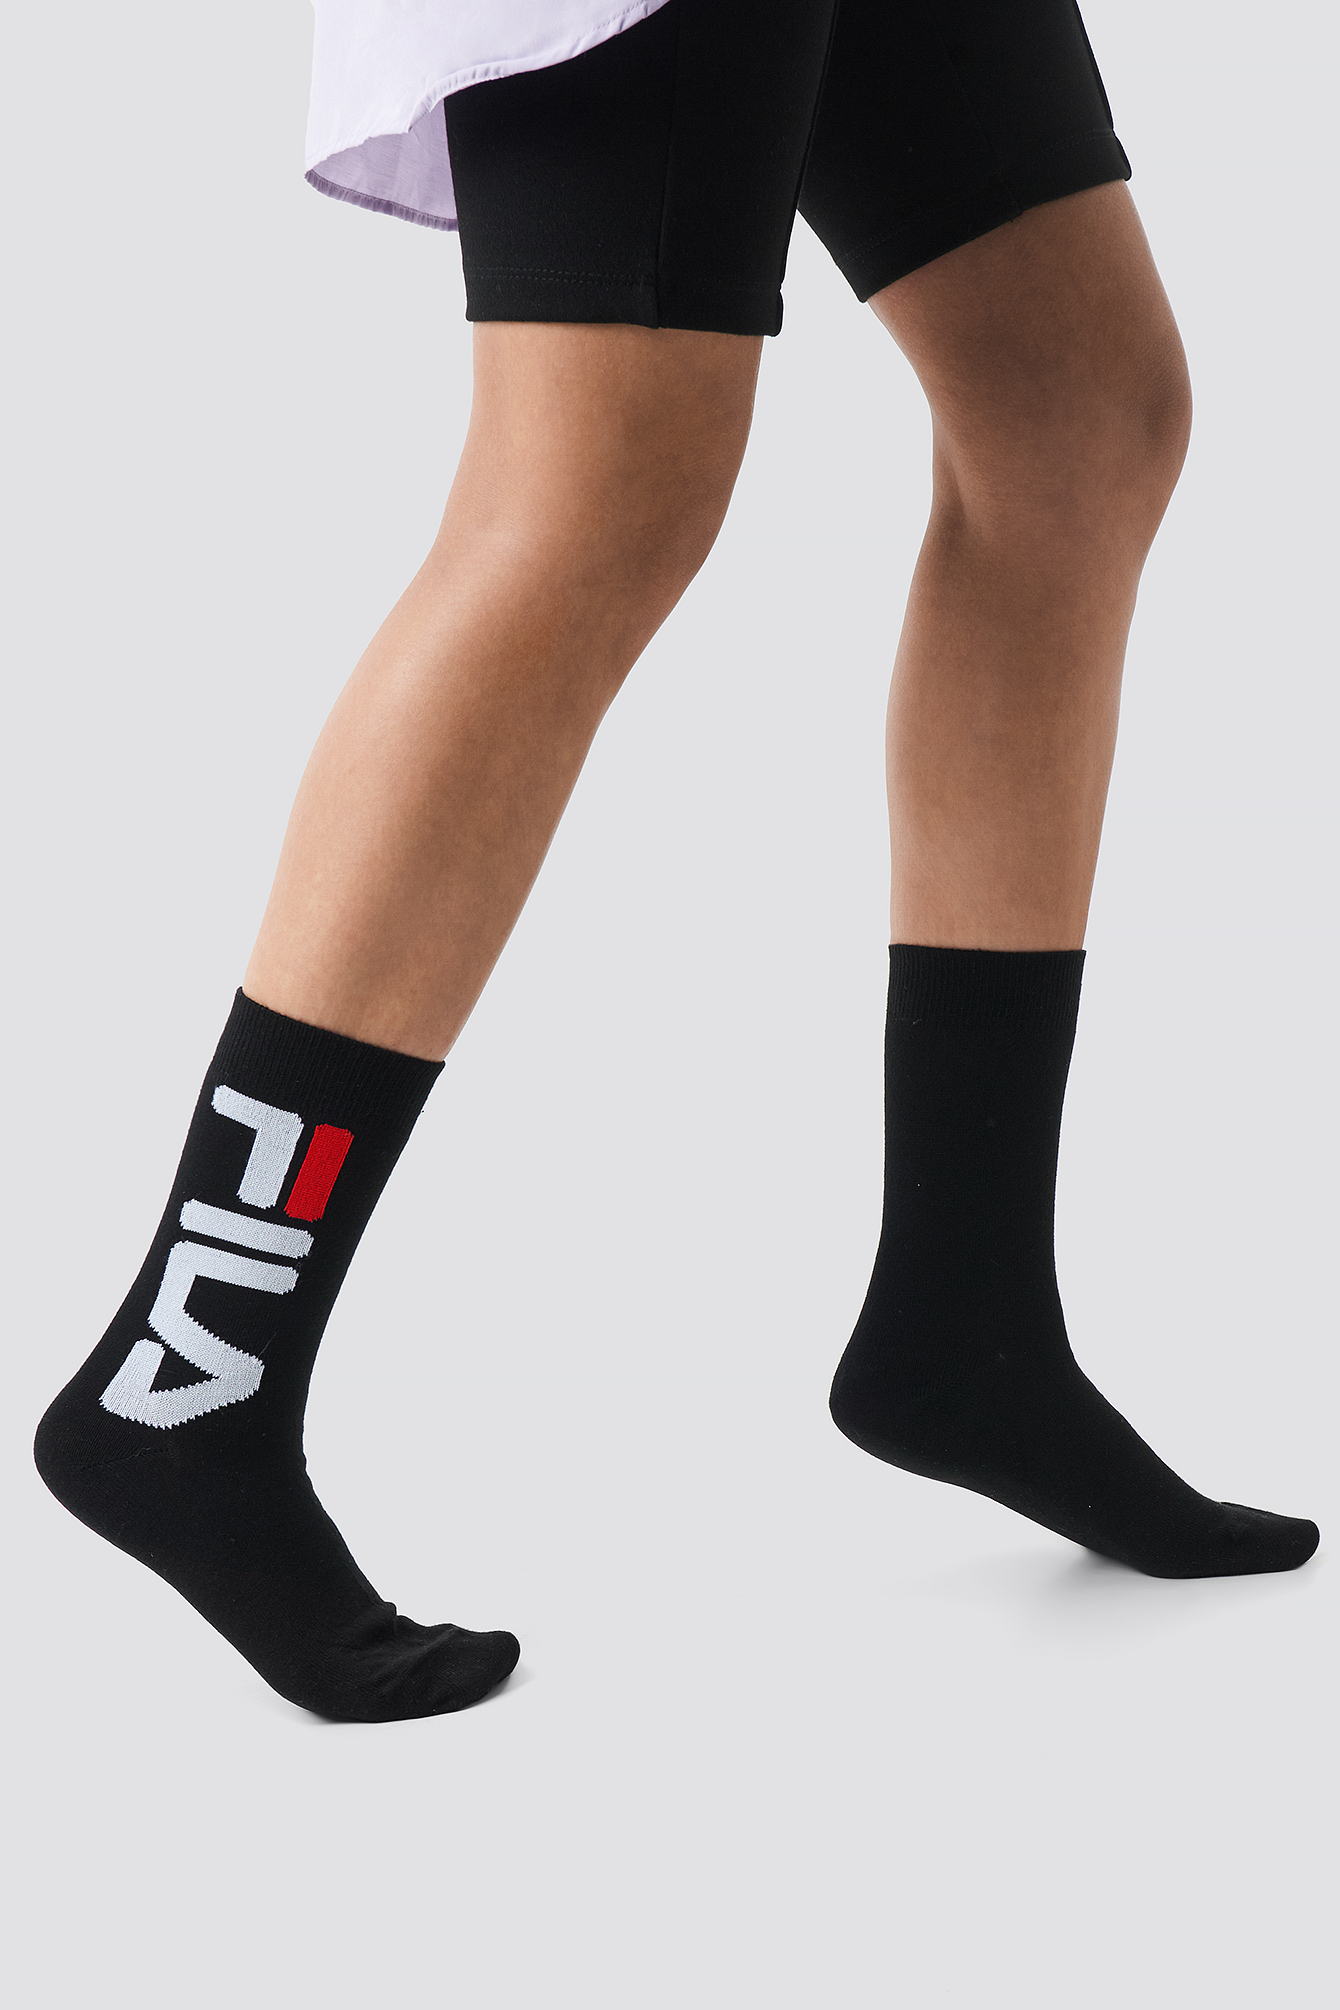 Fila Urban Socks NA-KD.COM